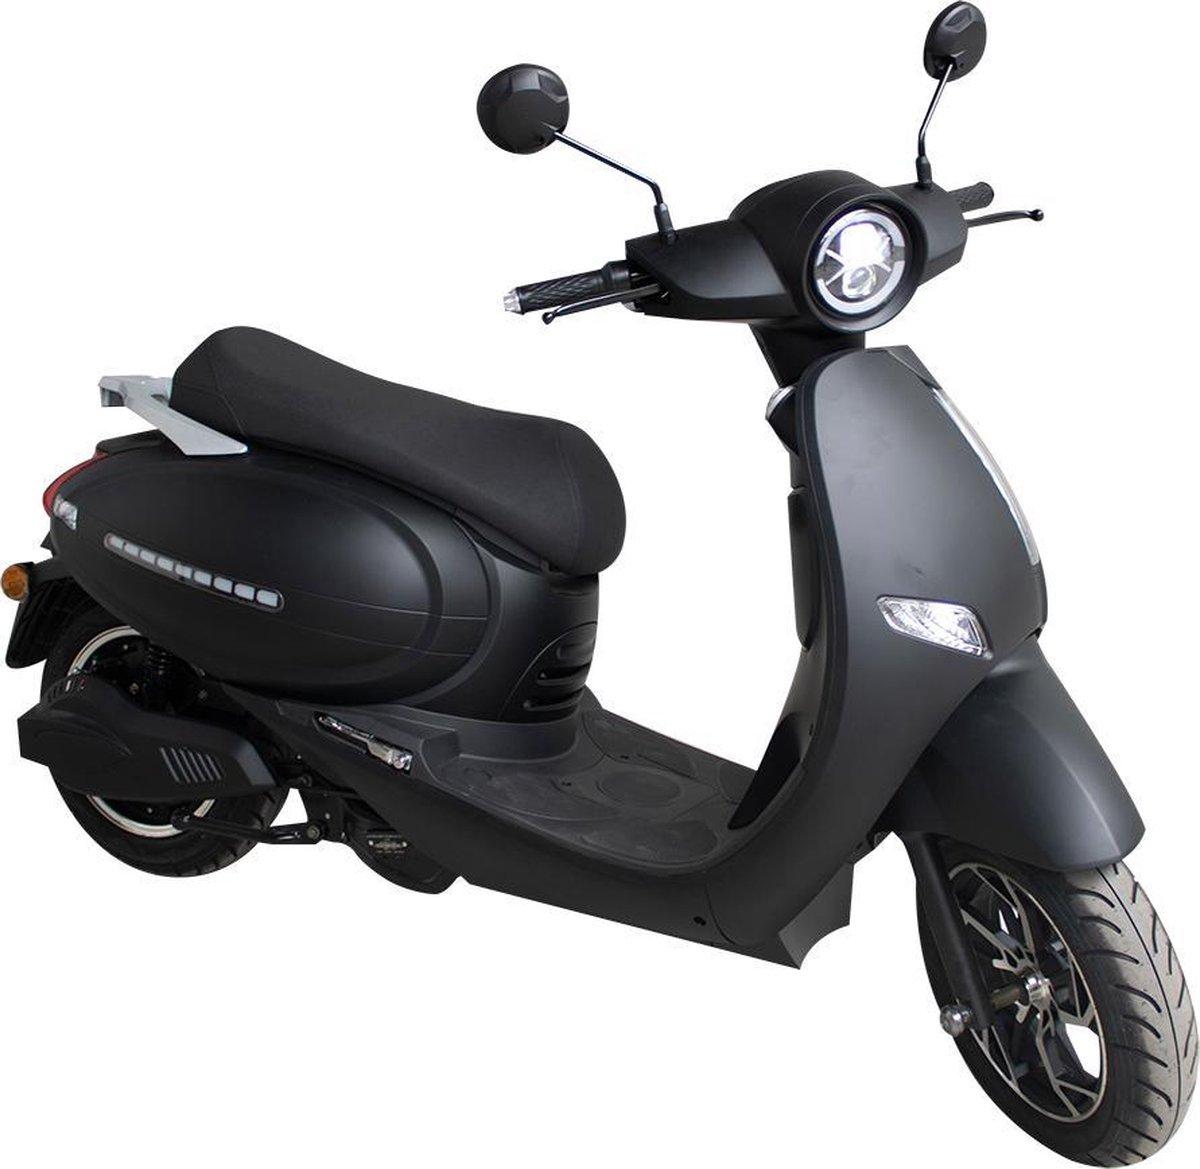 Elephant - City- Elektrische scooter - 25km/h - Actieradius 45km - Mat zwart